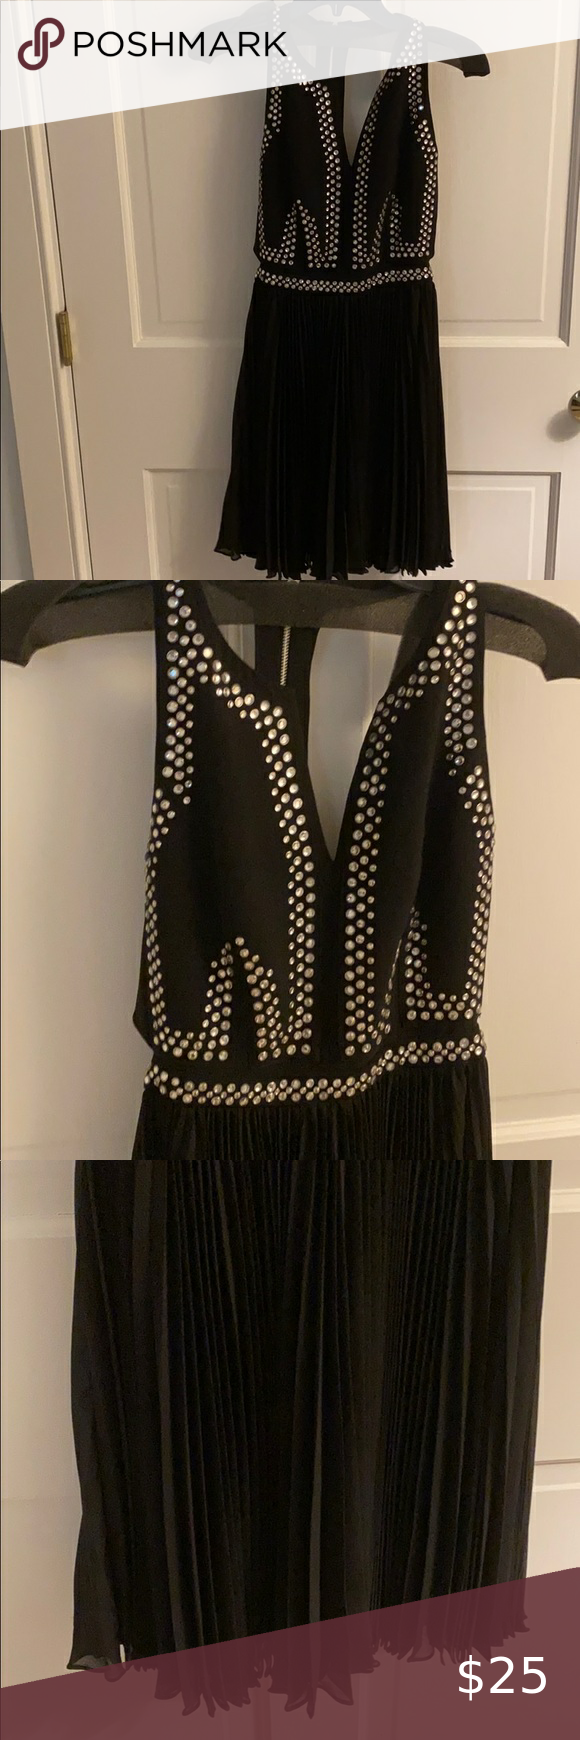 Rebecca Taylor Black Rhinestone Dress Rhinestone Dress Black Rhinestone Rebecca Taylor Dress [ 1740 x 580 Pixel ]